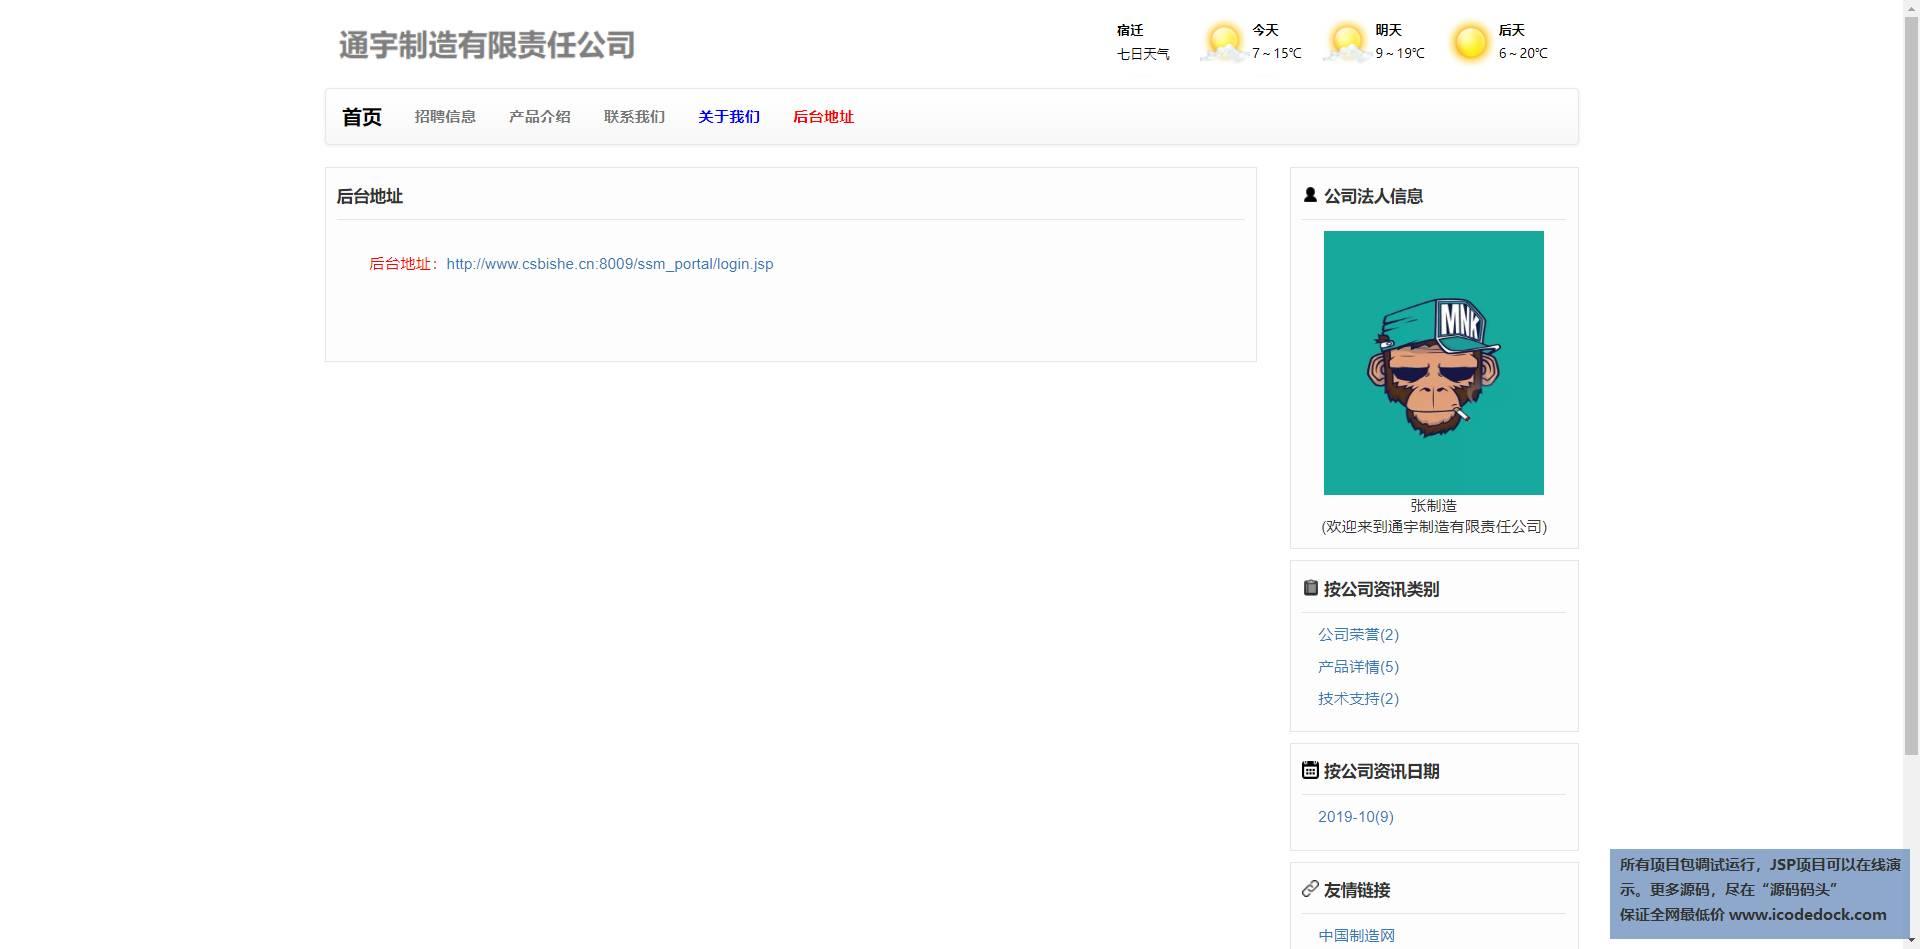 ssm企业网站源码下载(php网站源码 下载) (https://www.oilcn.net.cn/) 网站运营 第23张